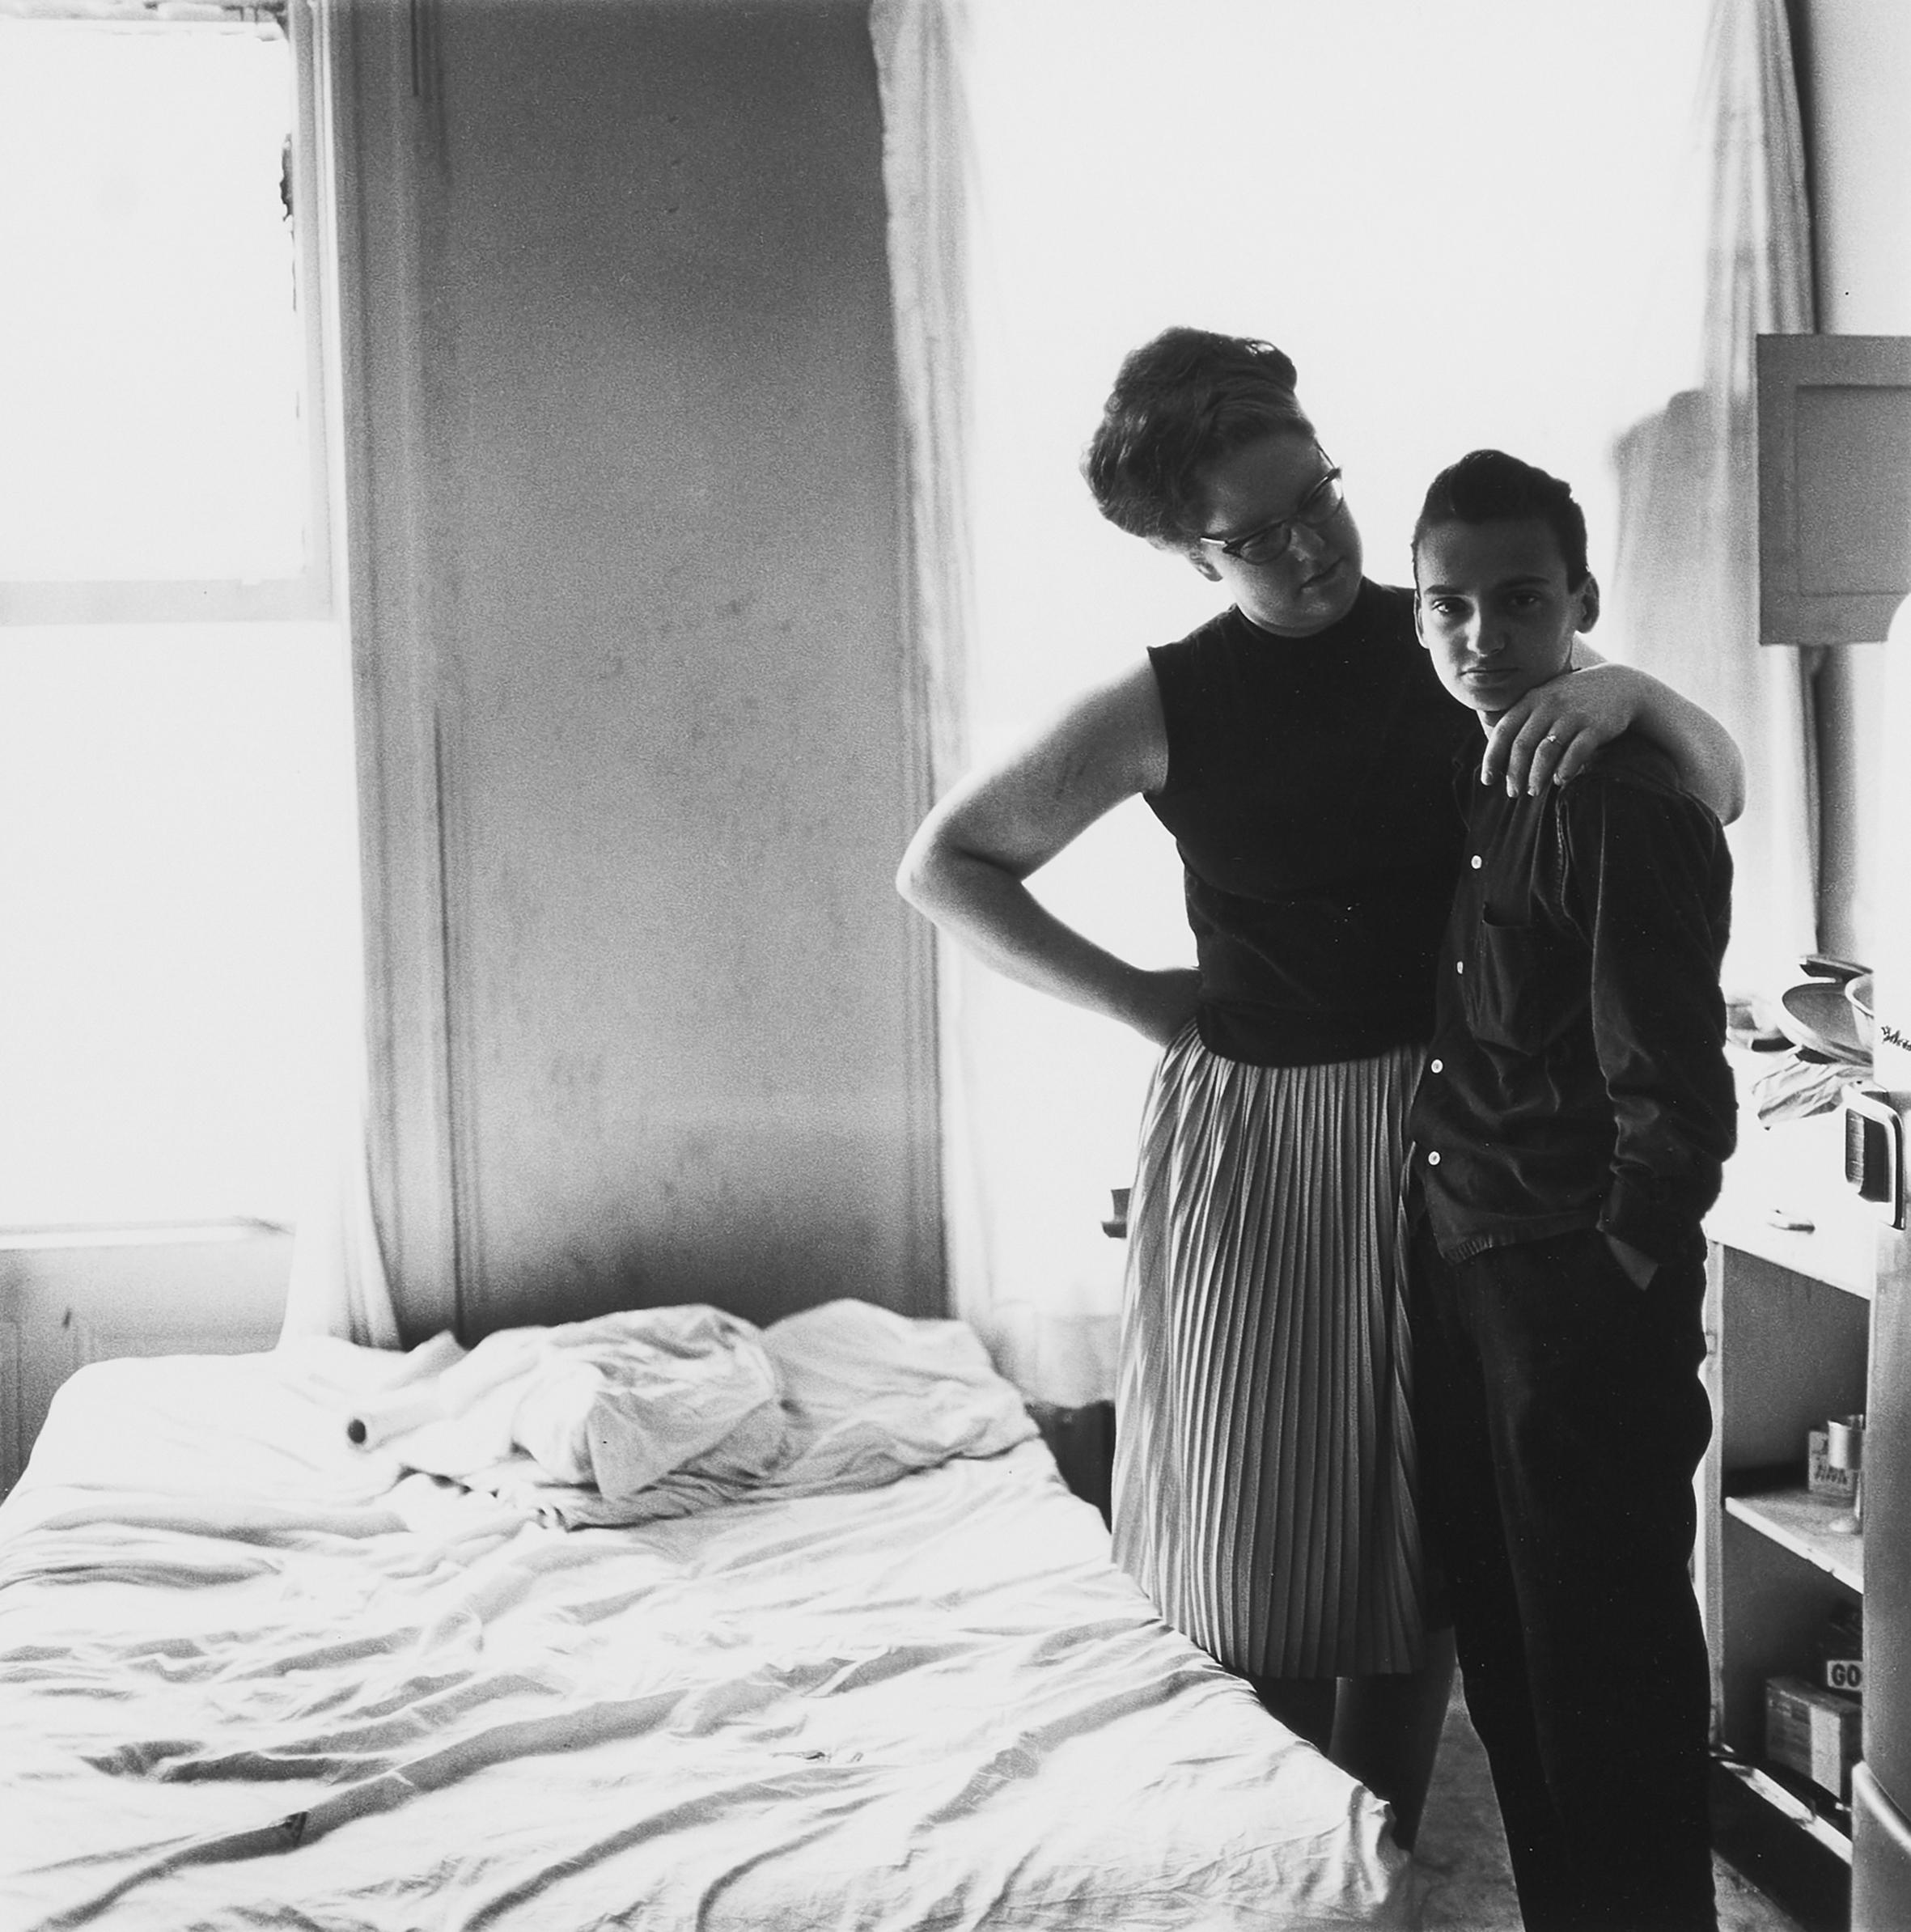 Diane Arbus, Two friends at home, N.Y.C., 1965 (Courtesy Galleria Massimo Minini).